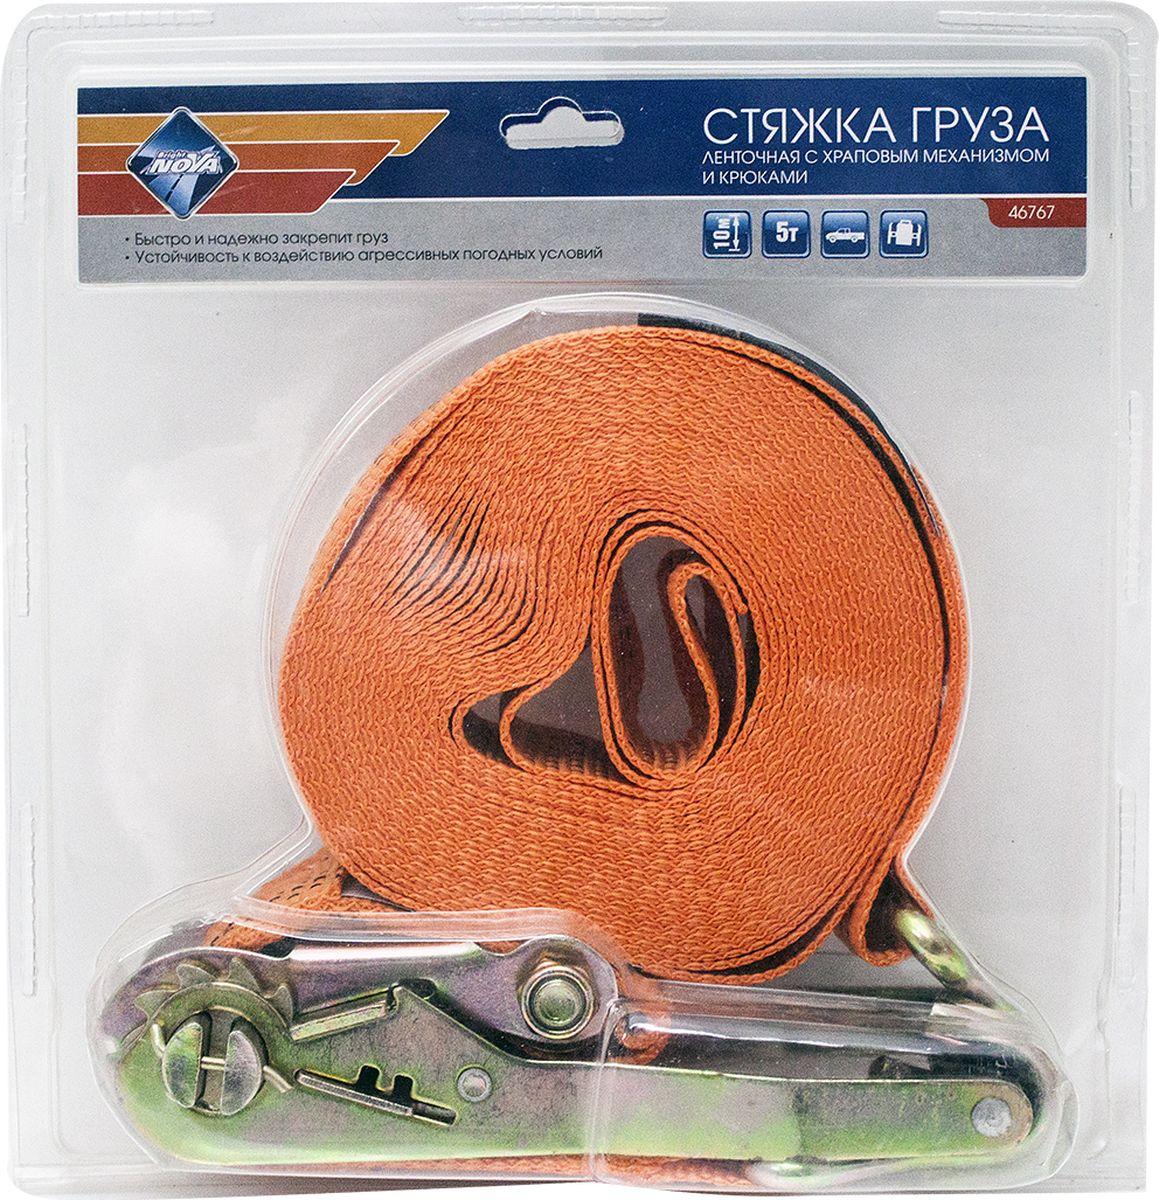 все цены на Стяжка груза ленточная Nova Bright, 46767, оранжевый, 5 см х 10 м онлайн